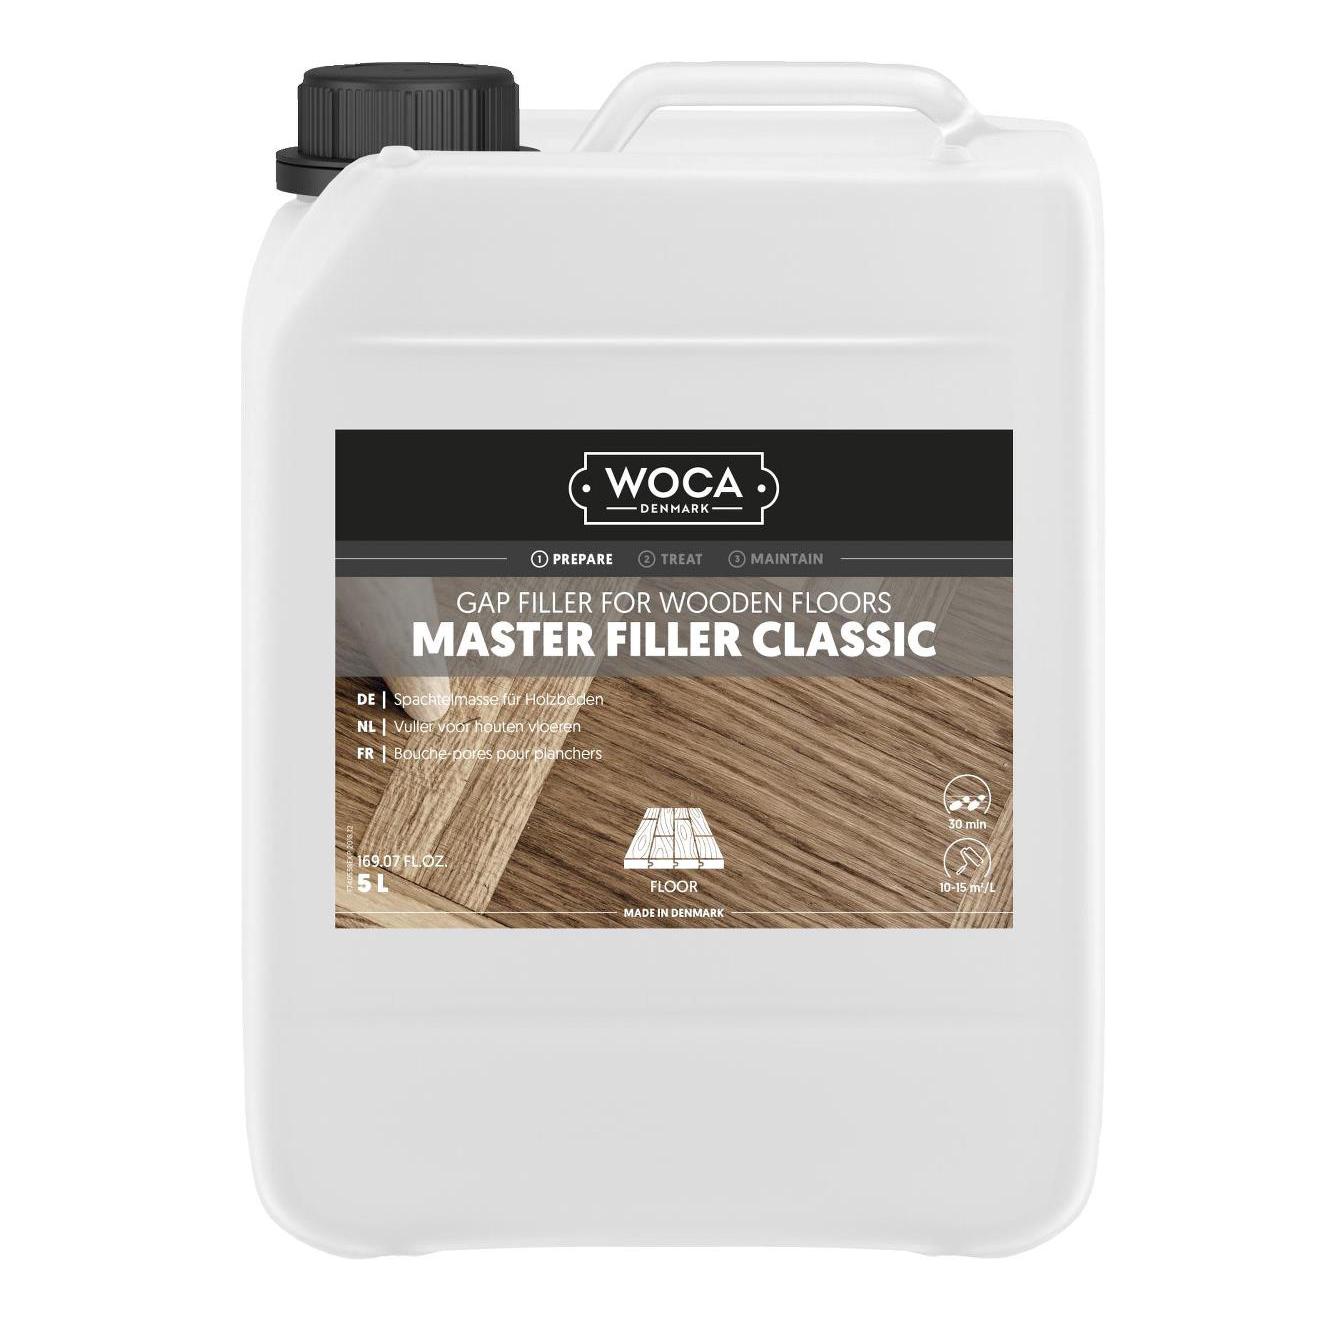 WOCA Master Filler Classic 5 ltr.